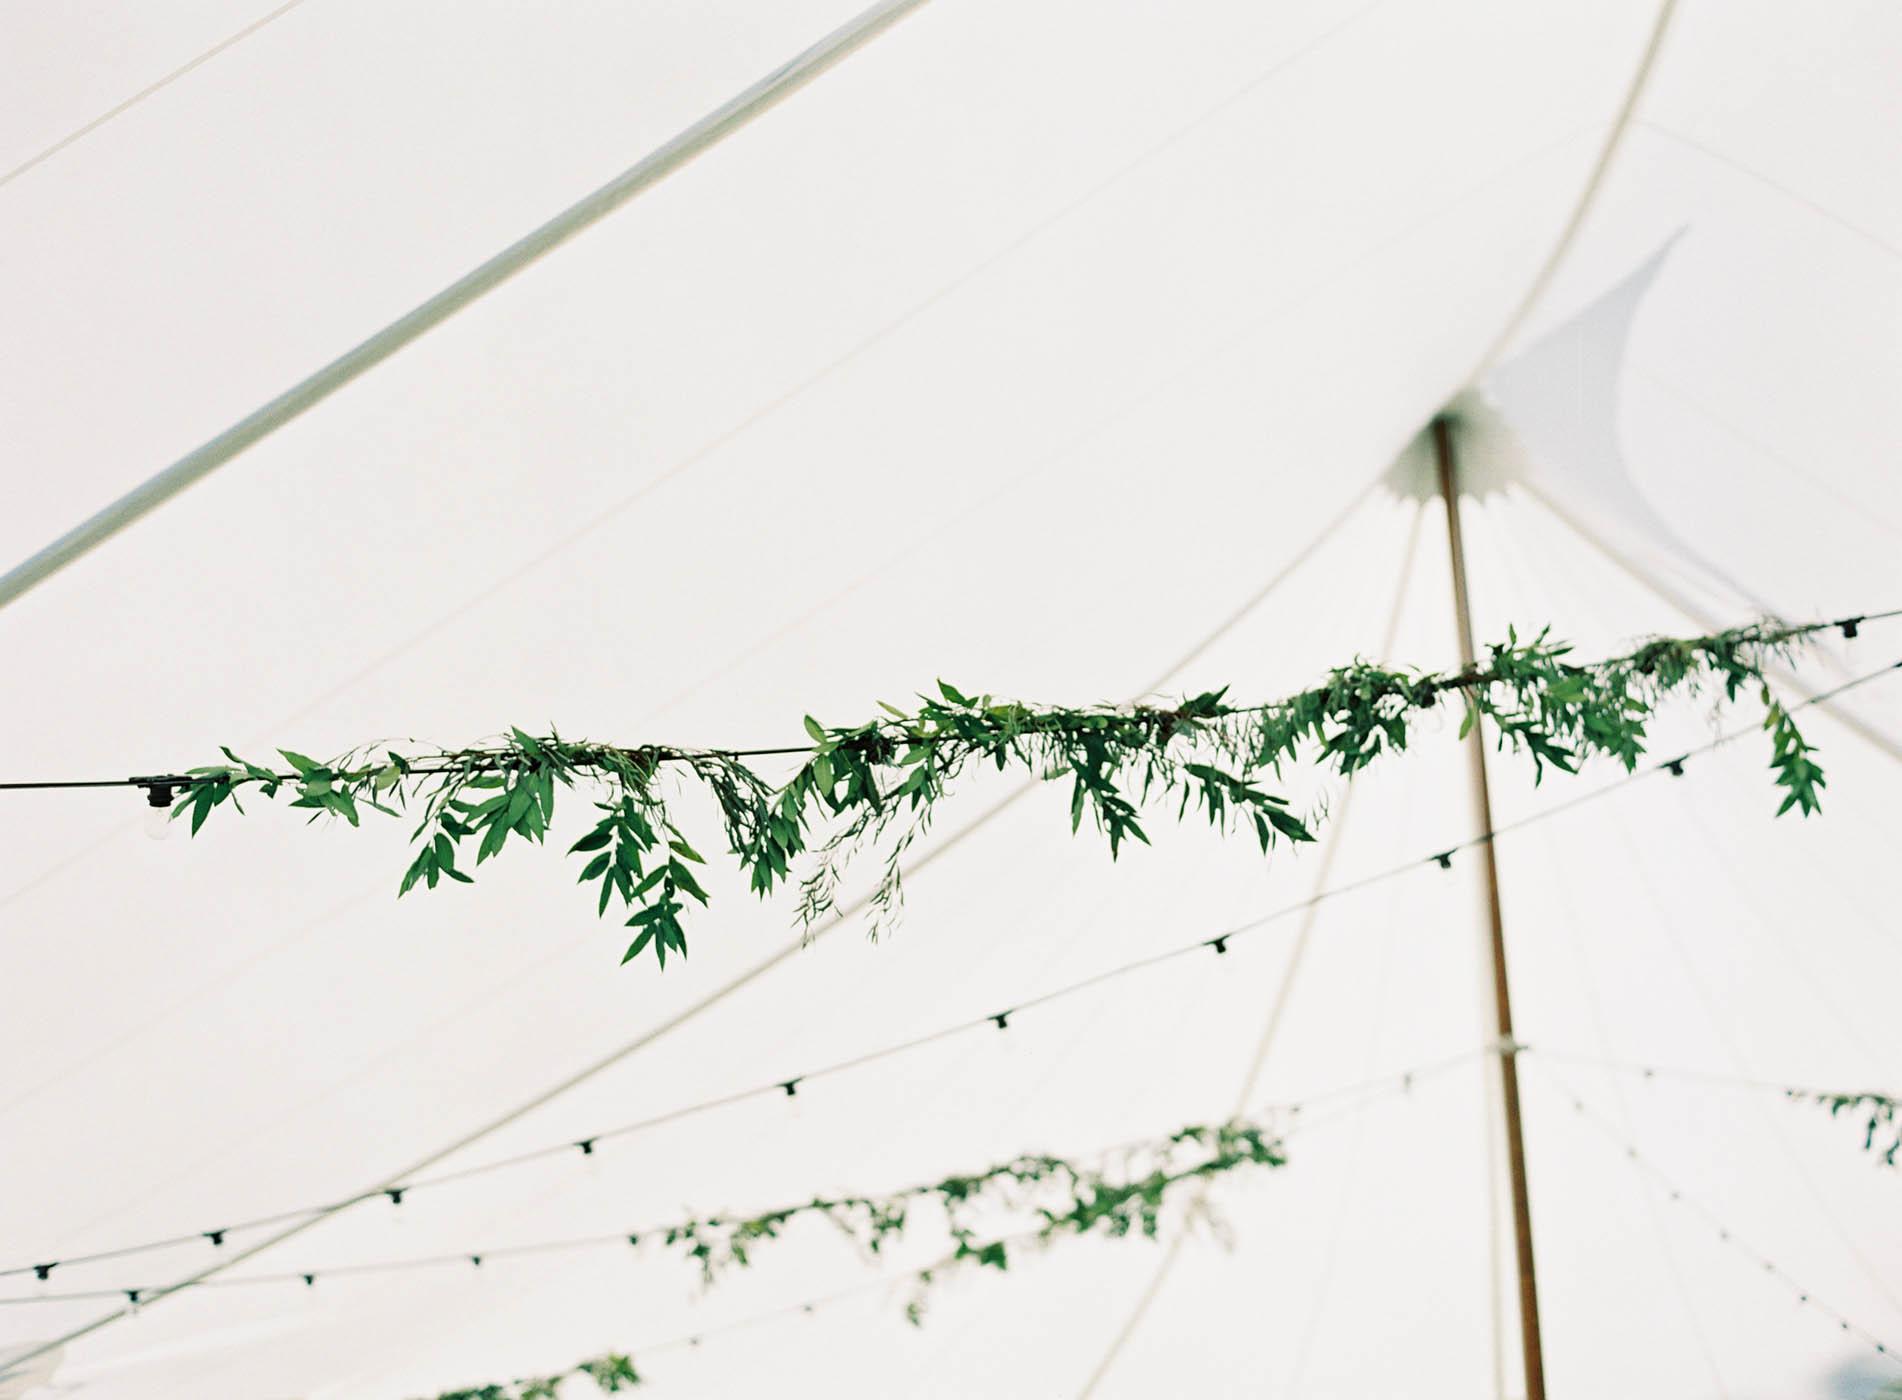 ojai-valley-inn-summer-wedding-jen-huang-34.jpg